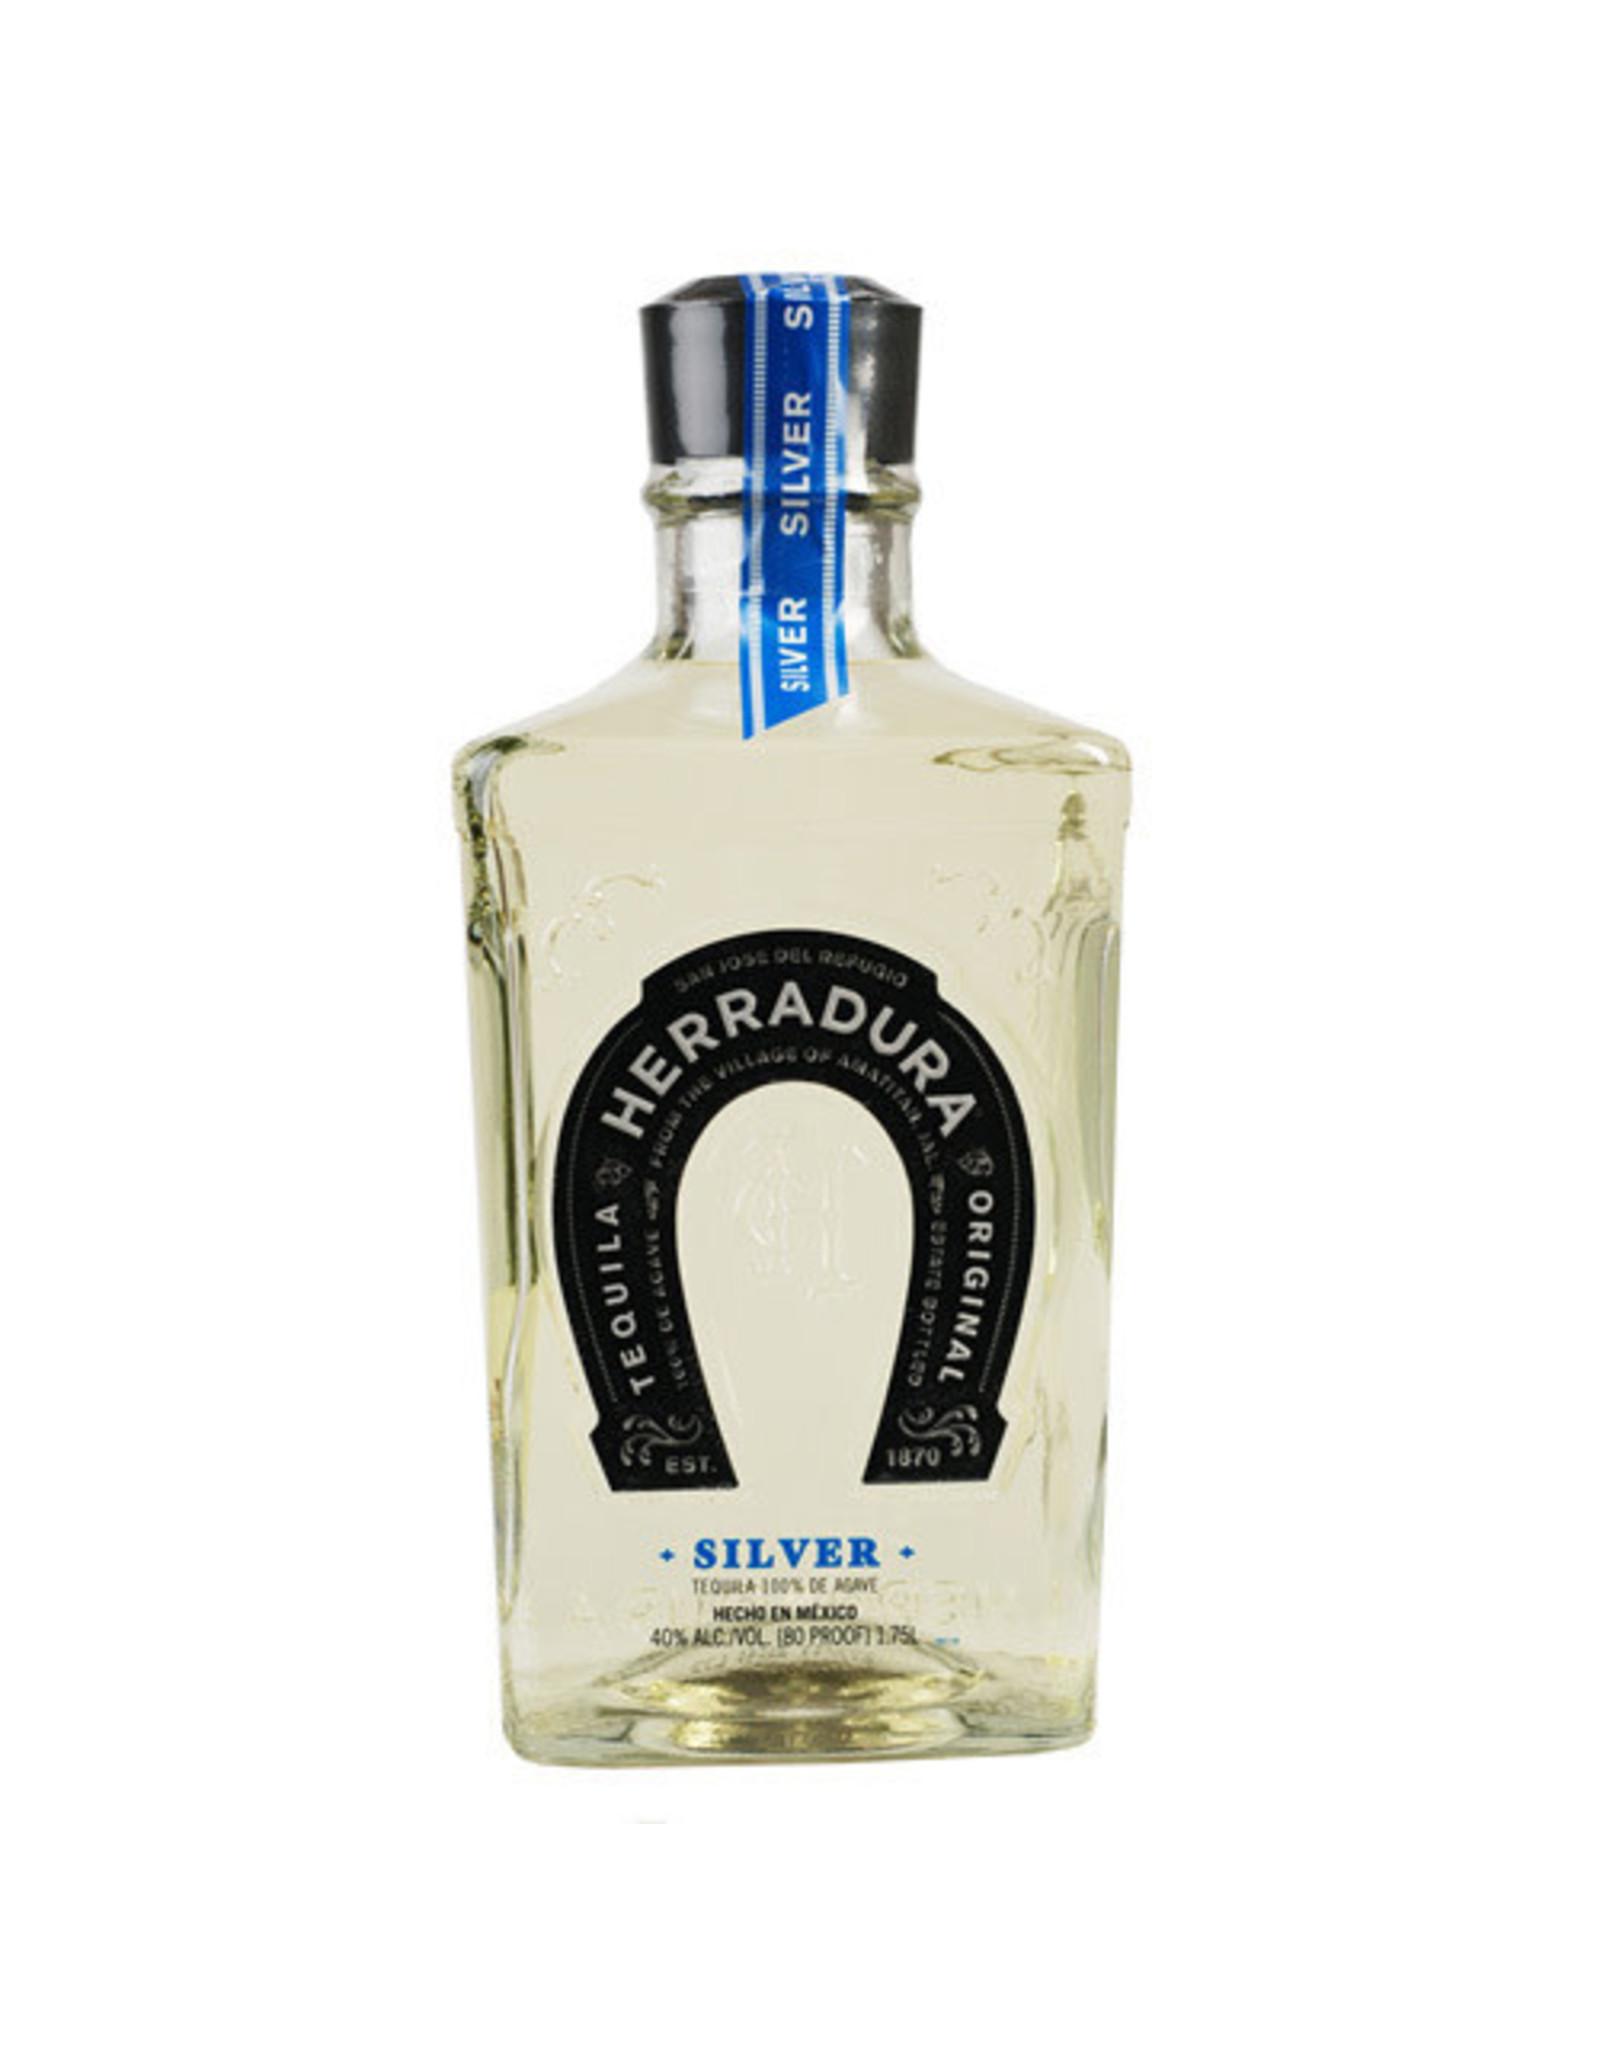 HERRADURA BLANCO TEQUILA 1.75L